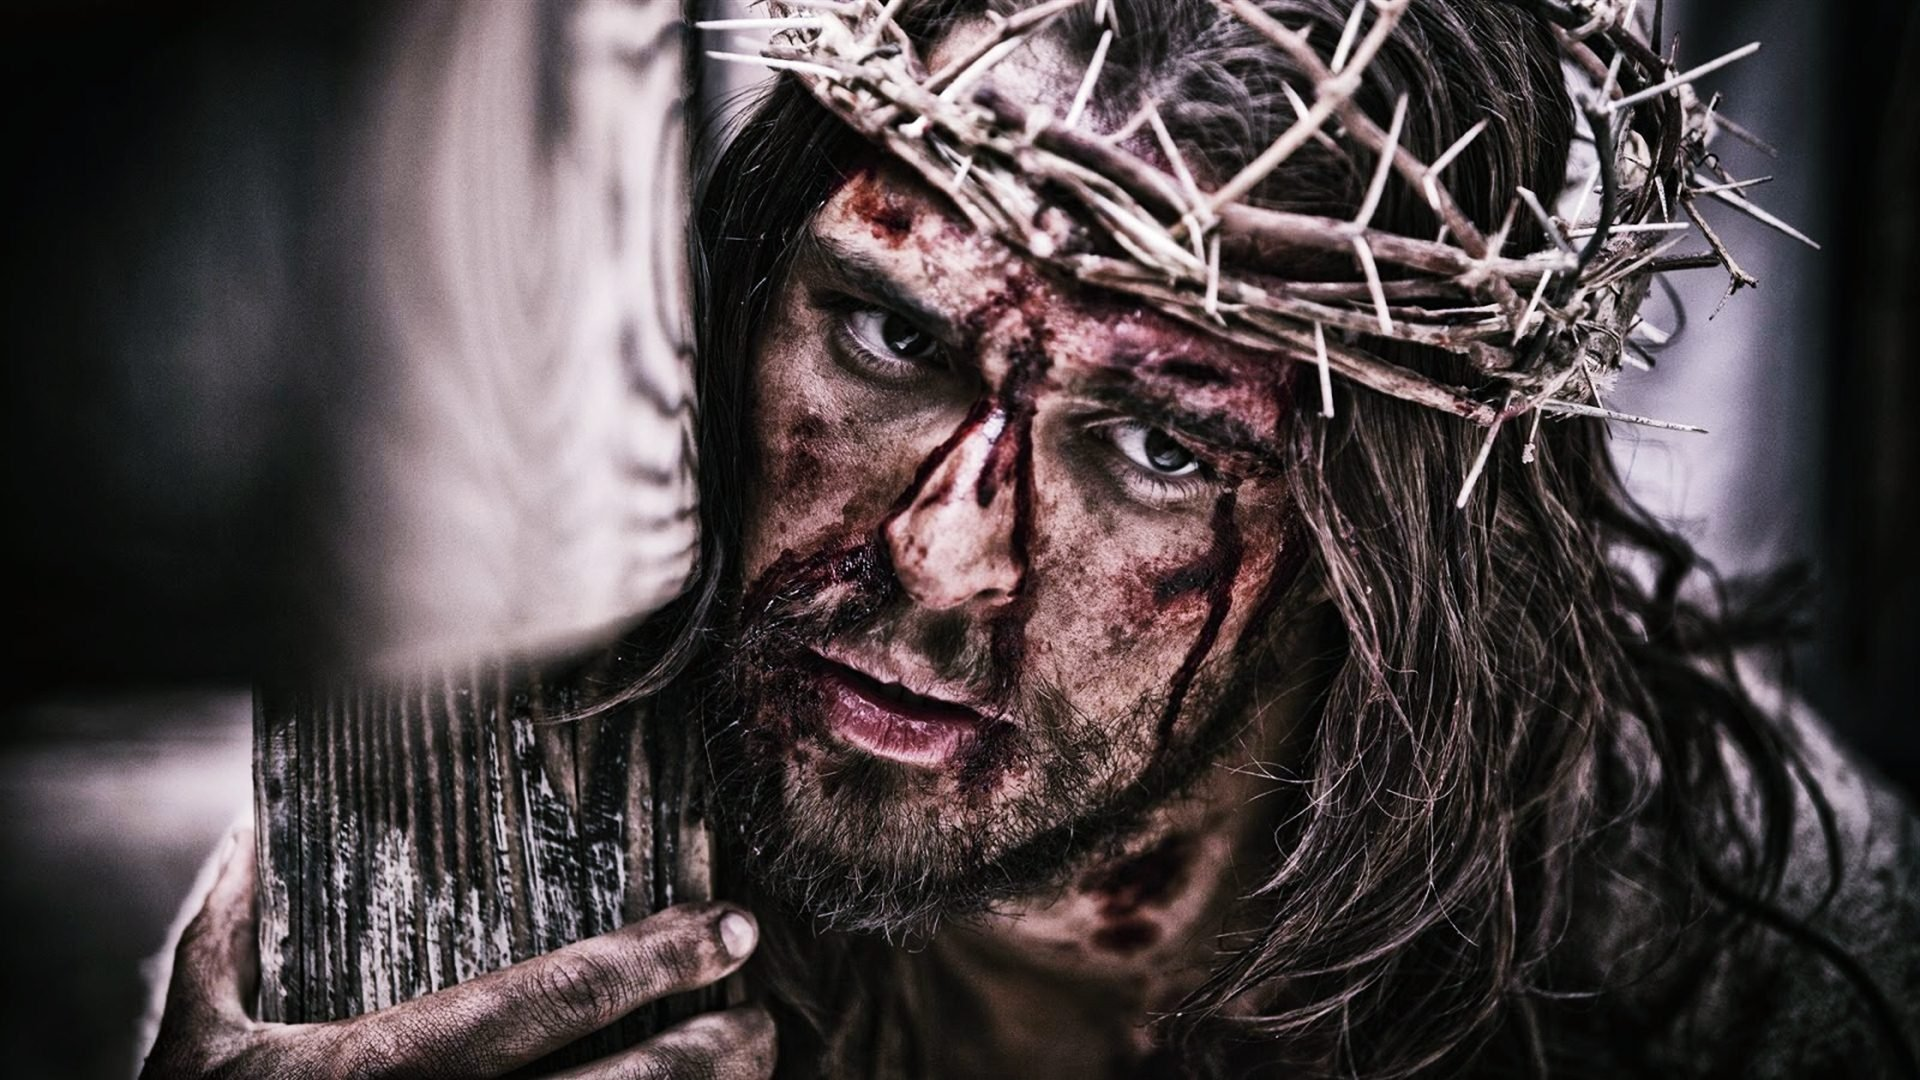 GOD drama religion movie film christian god son jesus blood wallpaper 1920x1080